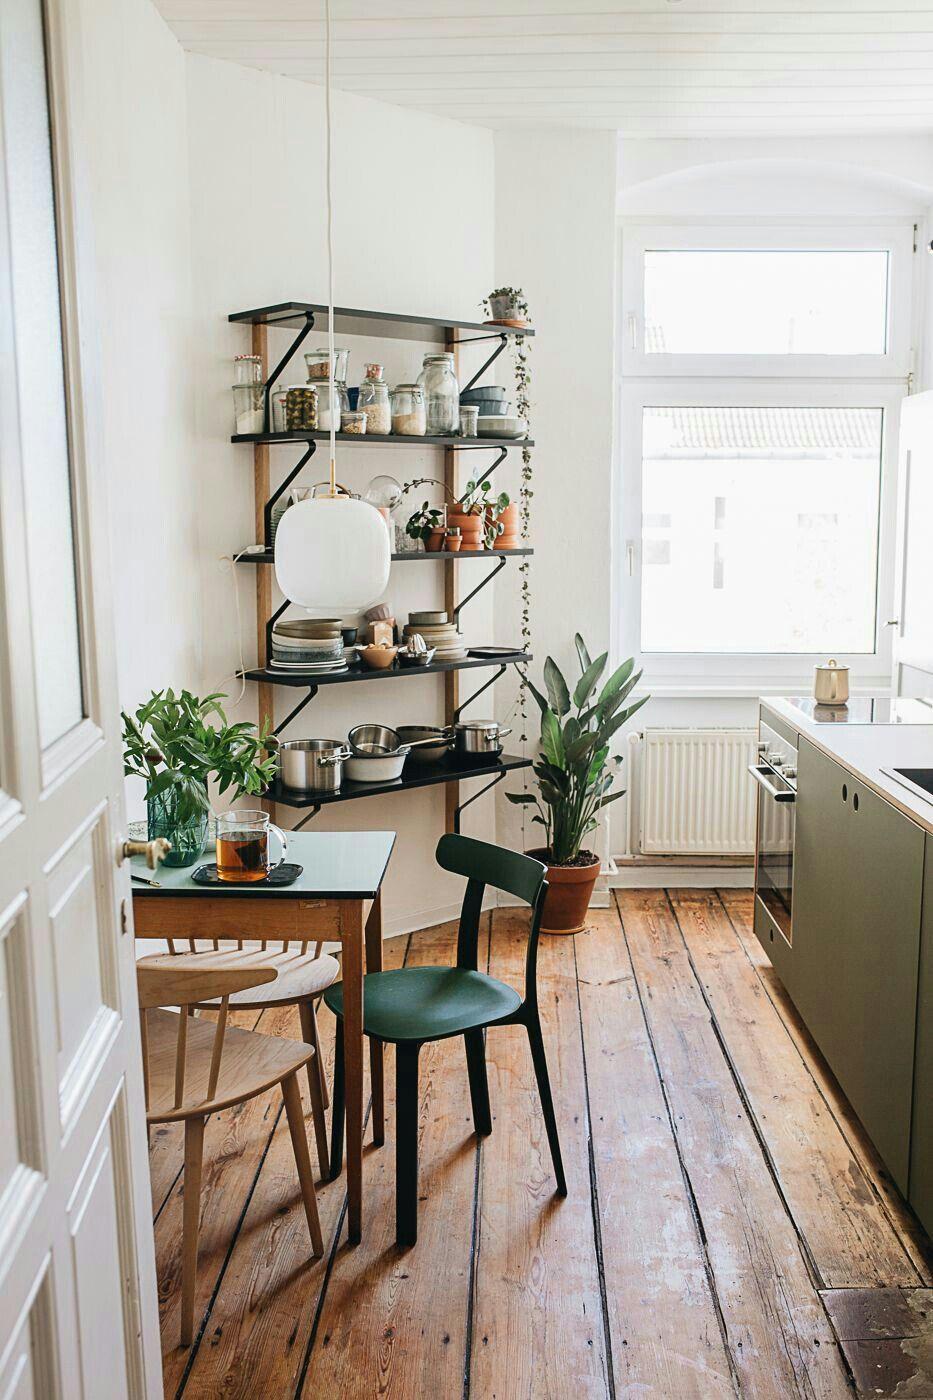 Kitchen Decor   Mutfak Dekoru   Earth tones kitchen, Kitchen ...